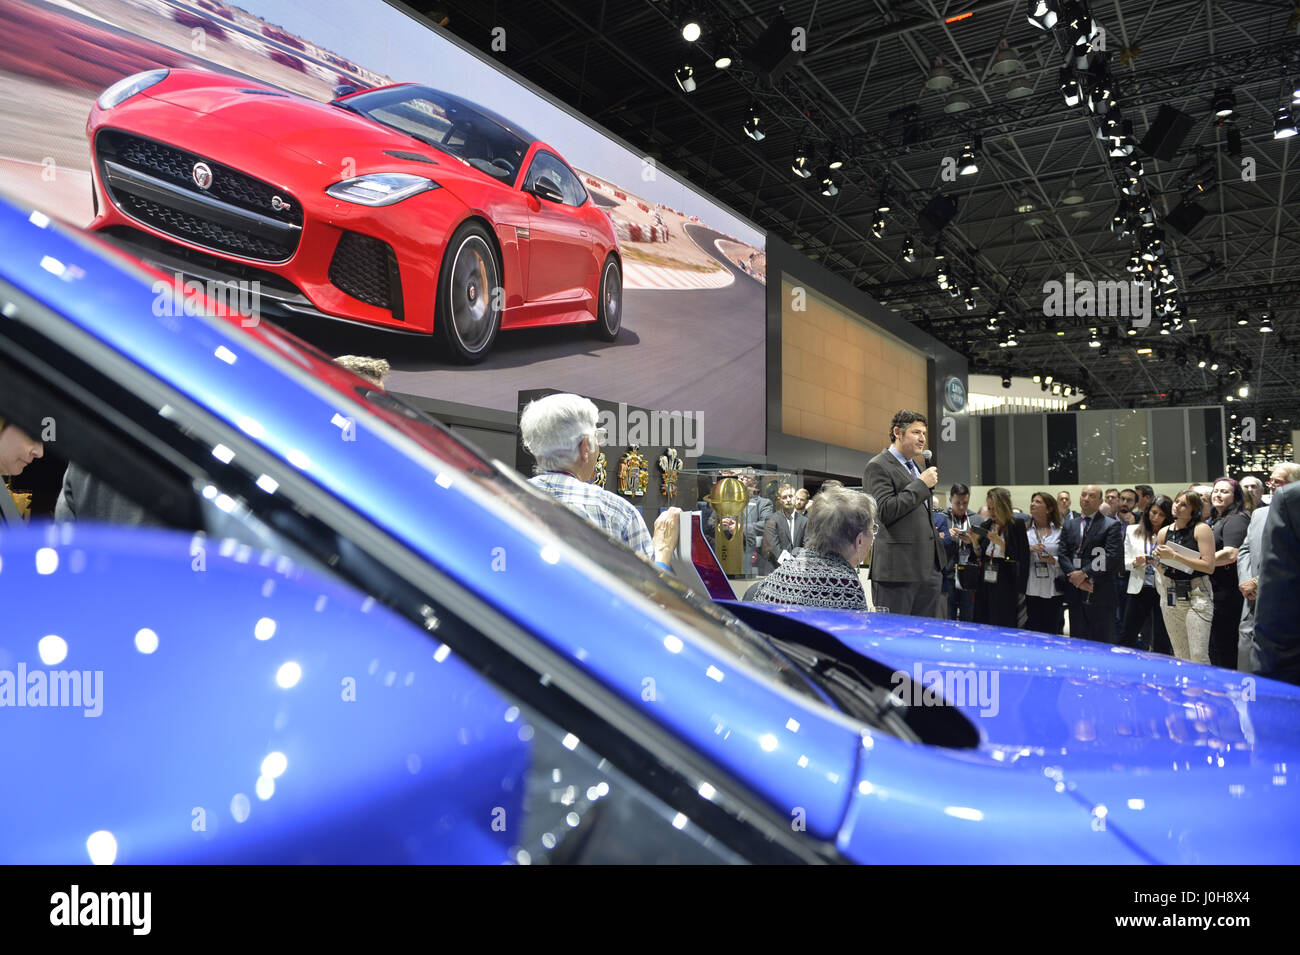 Manhattan, New York, USA. 12th Apr, 2017. STUART SCHORR, Vice President Of  Communications, Jaguar Land Rover North America, Seen Holding Microphone  Behind ...